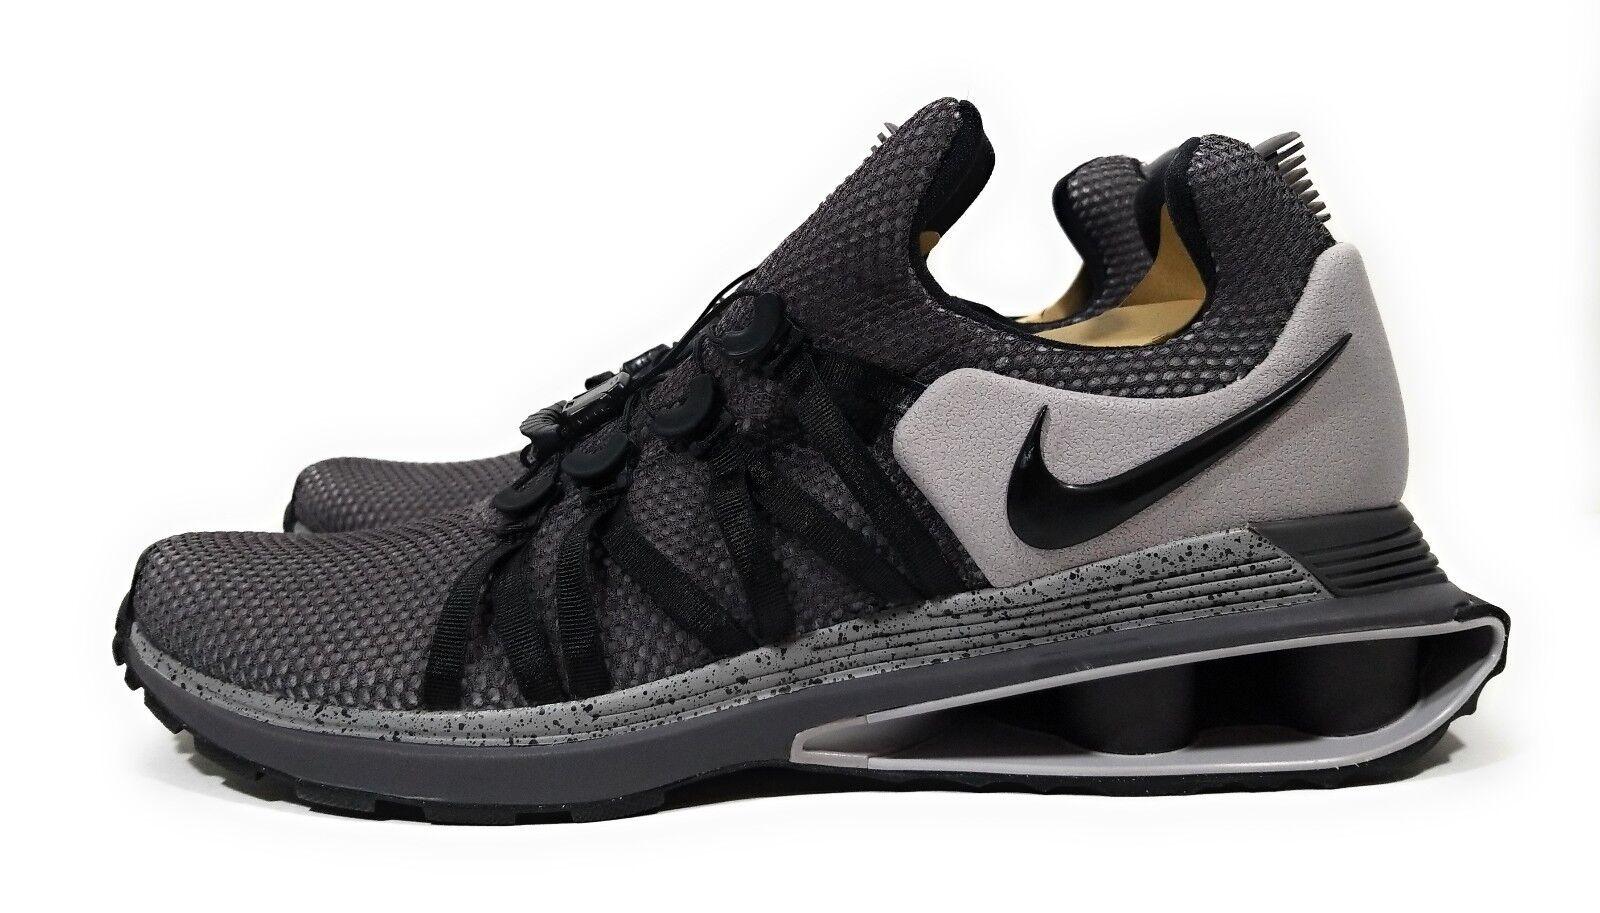 Nike Shox Gravity Mens Running Cross Training shoes Grey Black Size 13